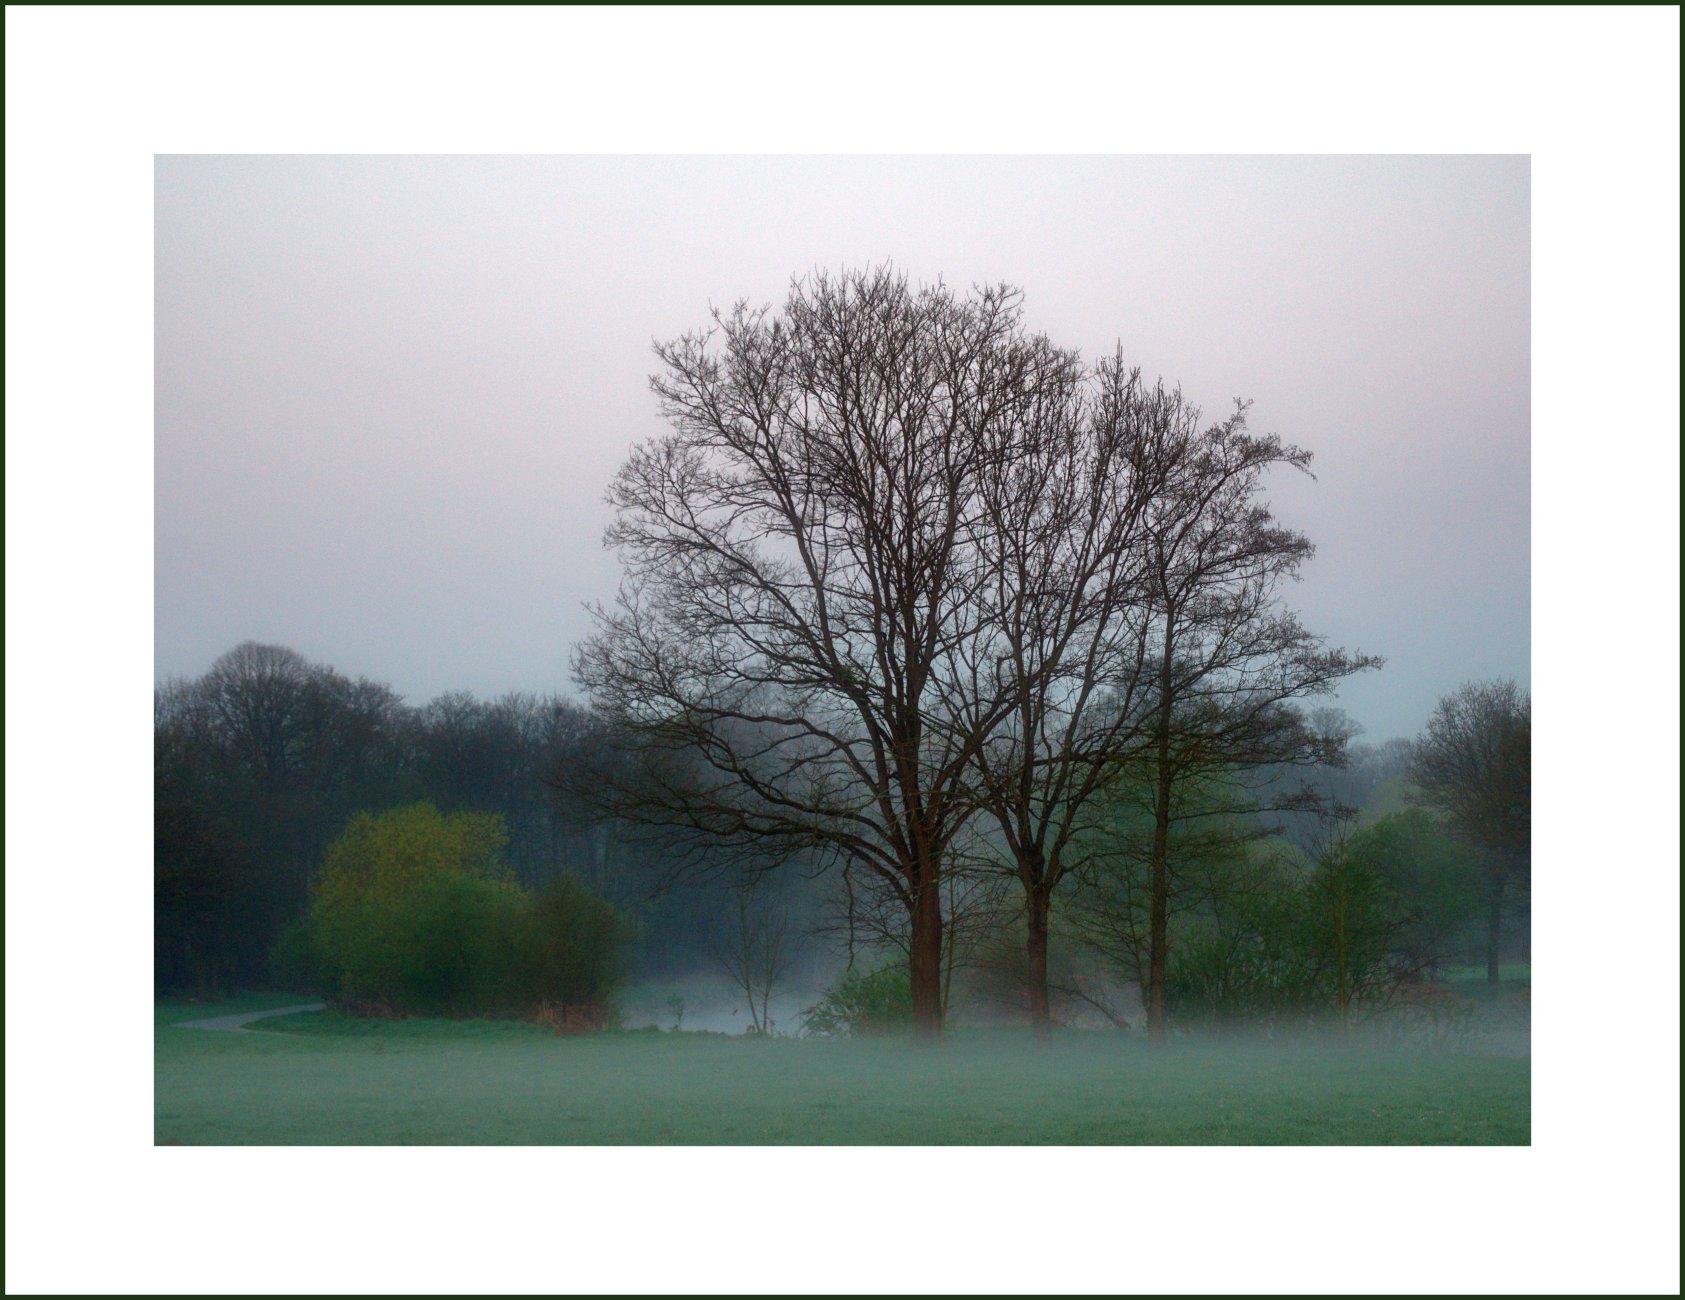 Morning At The River - 3